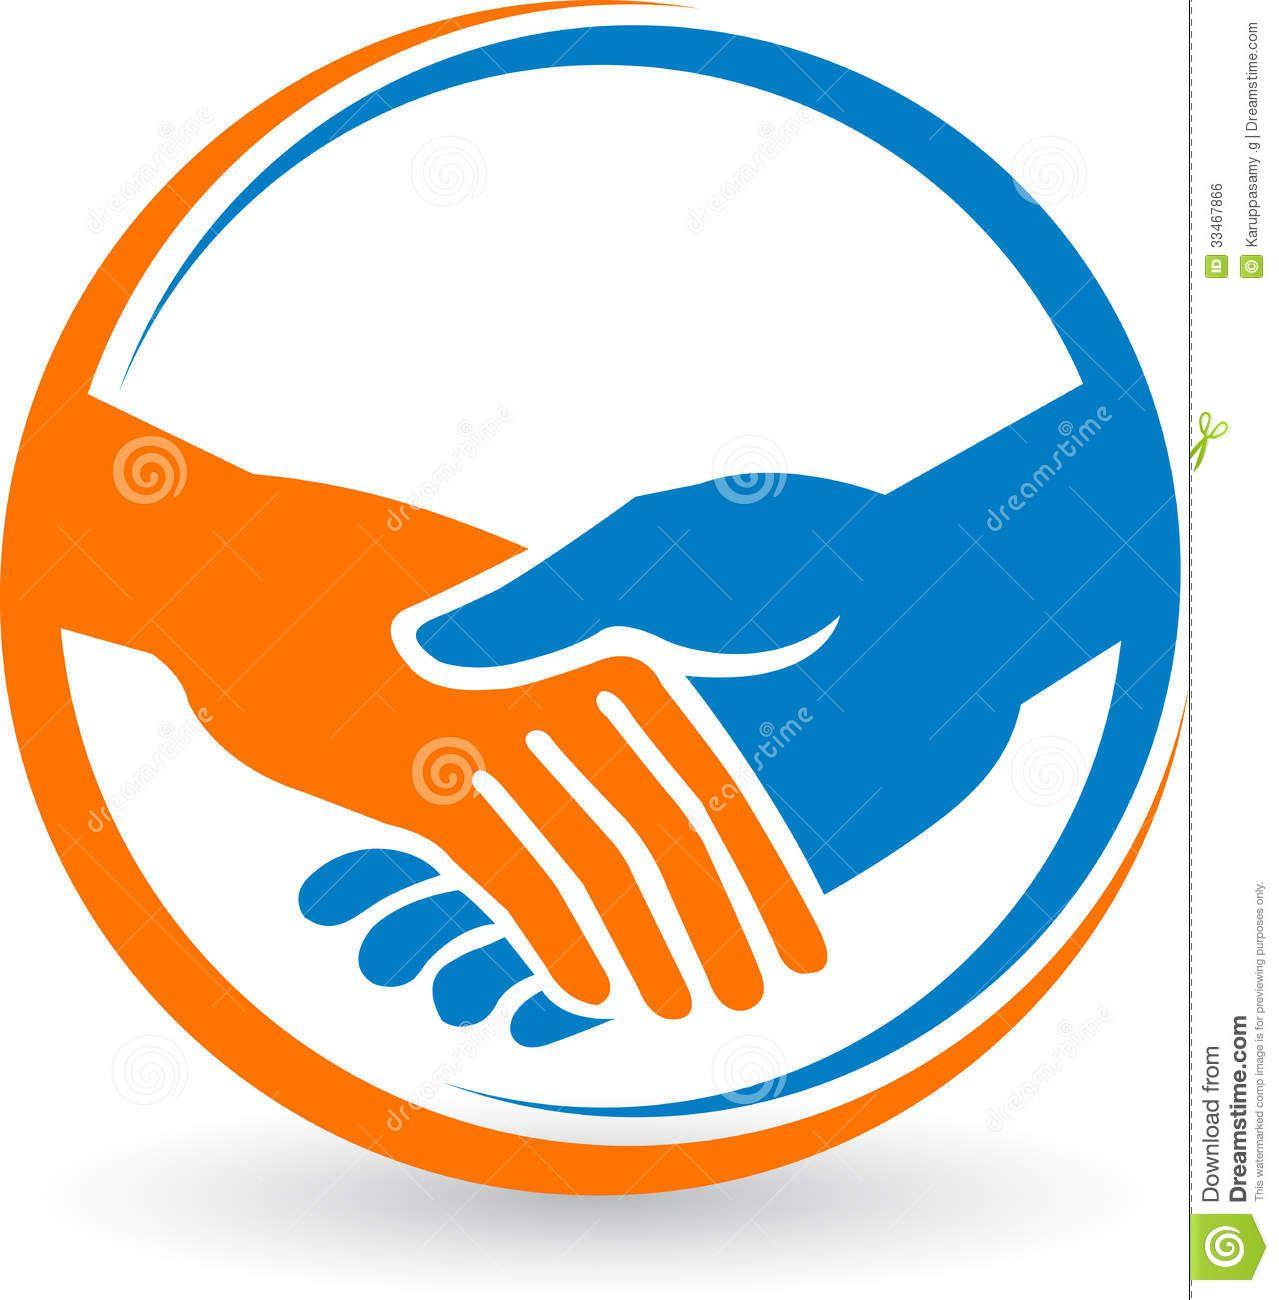 Hand Shake Logo.